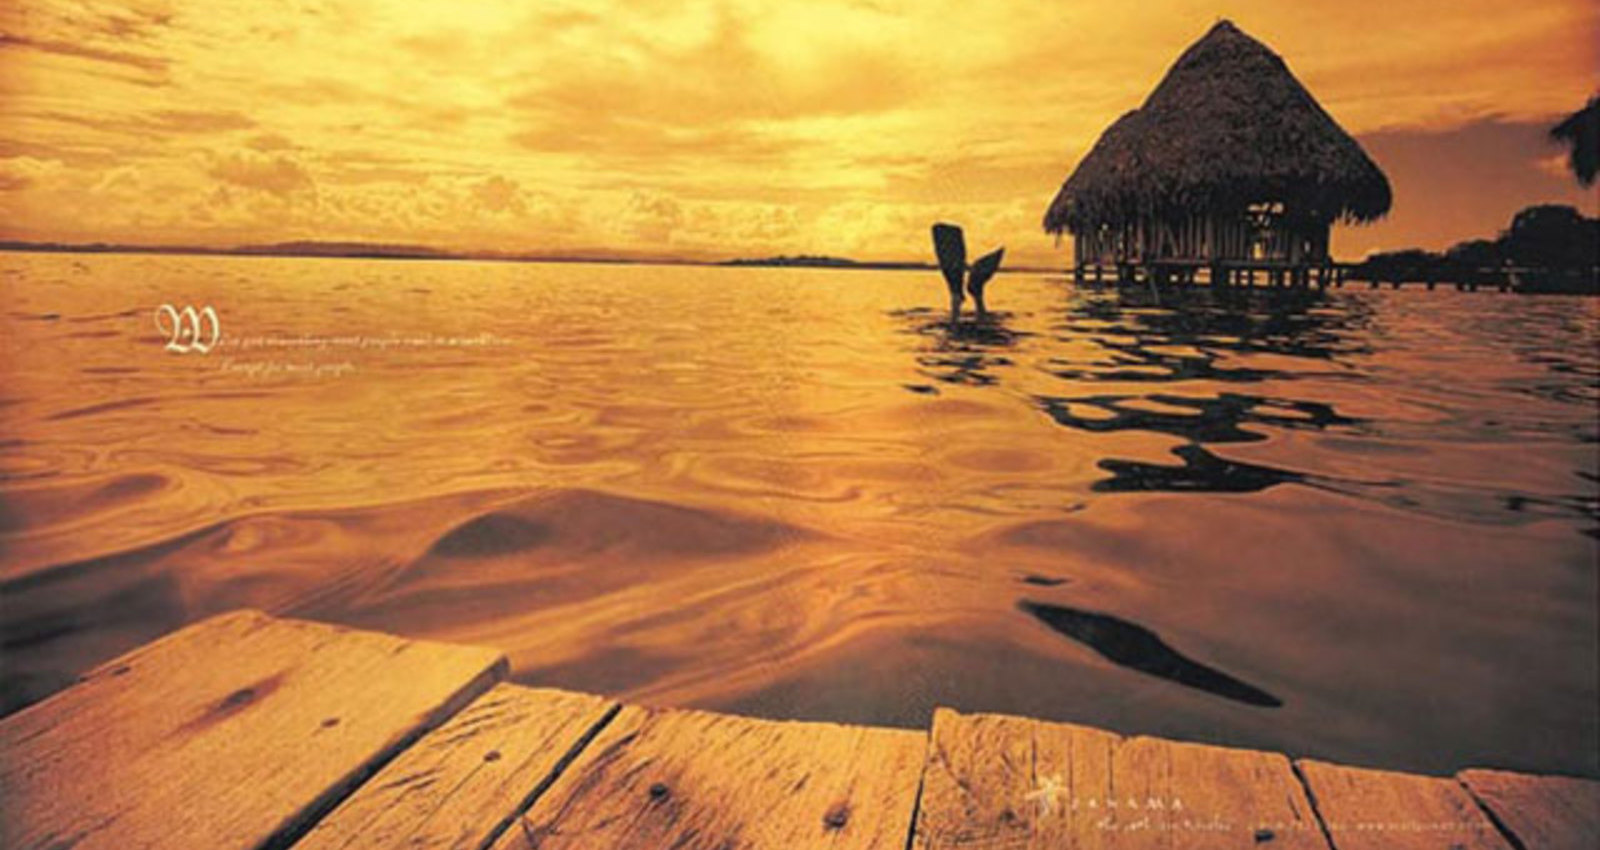 Bocas Lunch, Kuna Indians, Hut & Dock